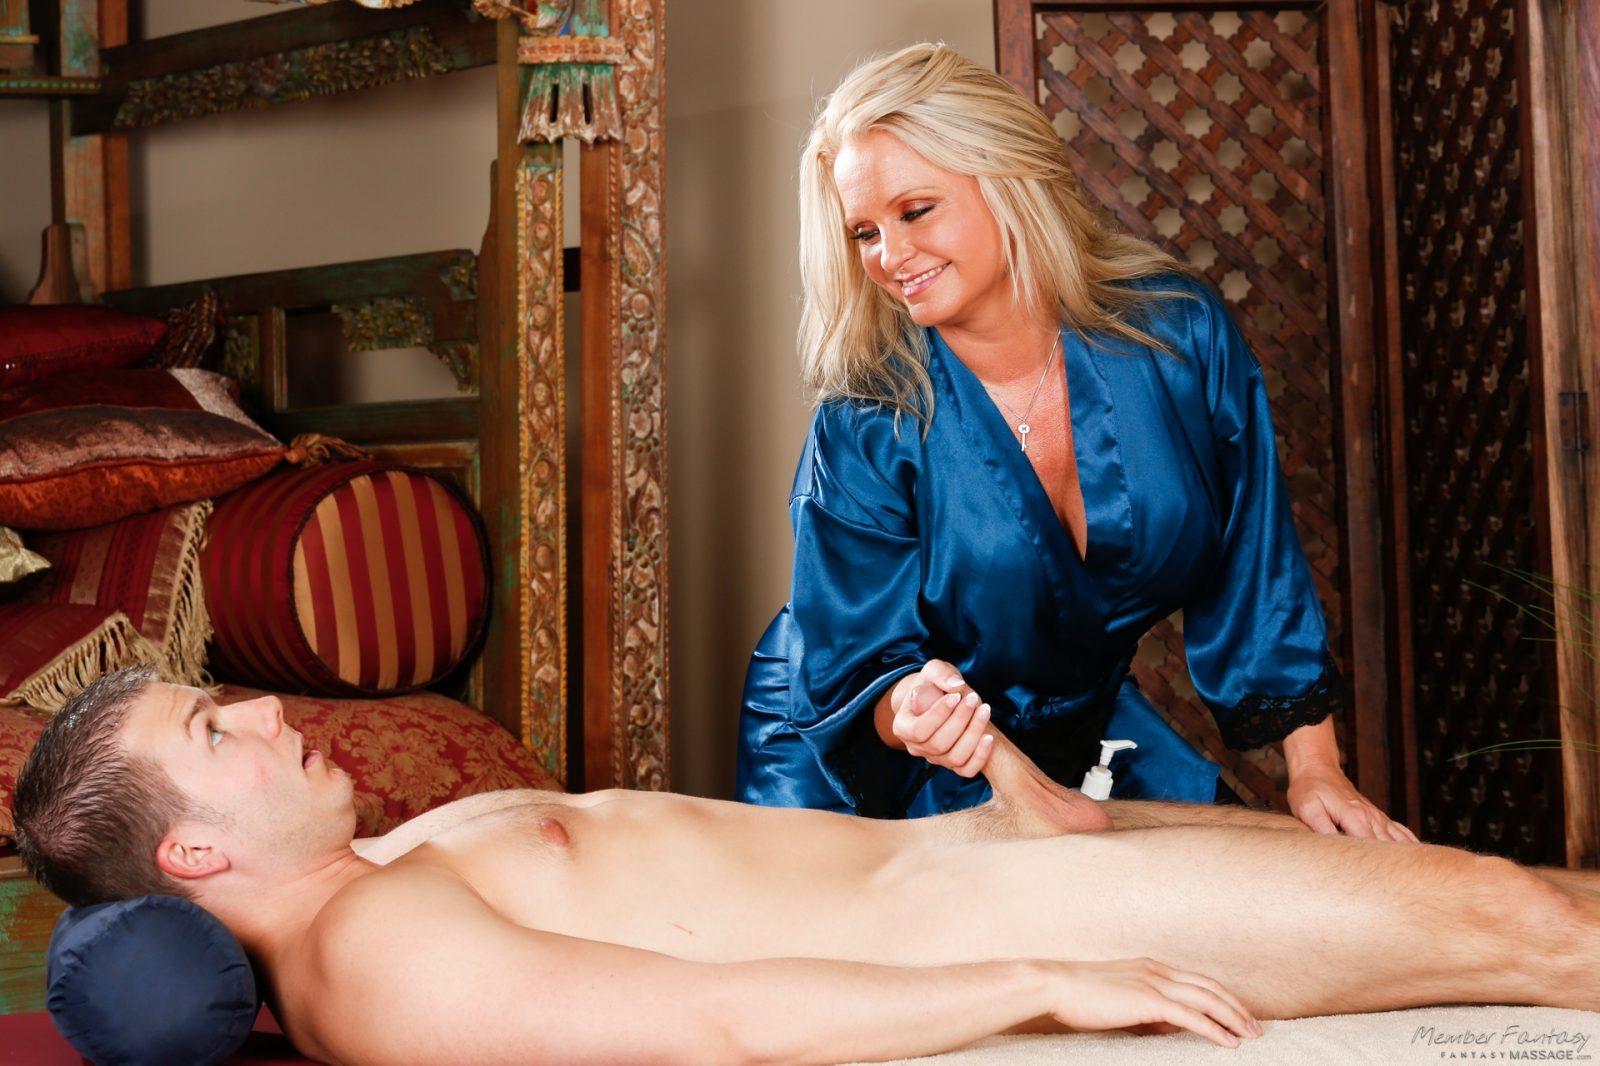 The milf masseuse